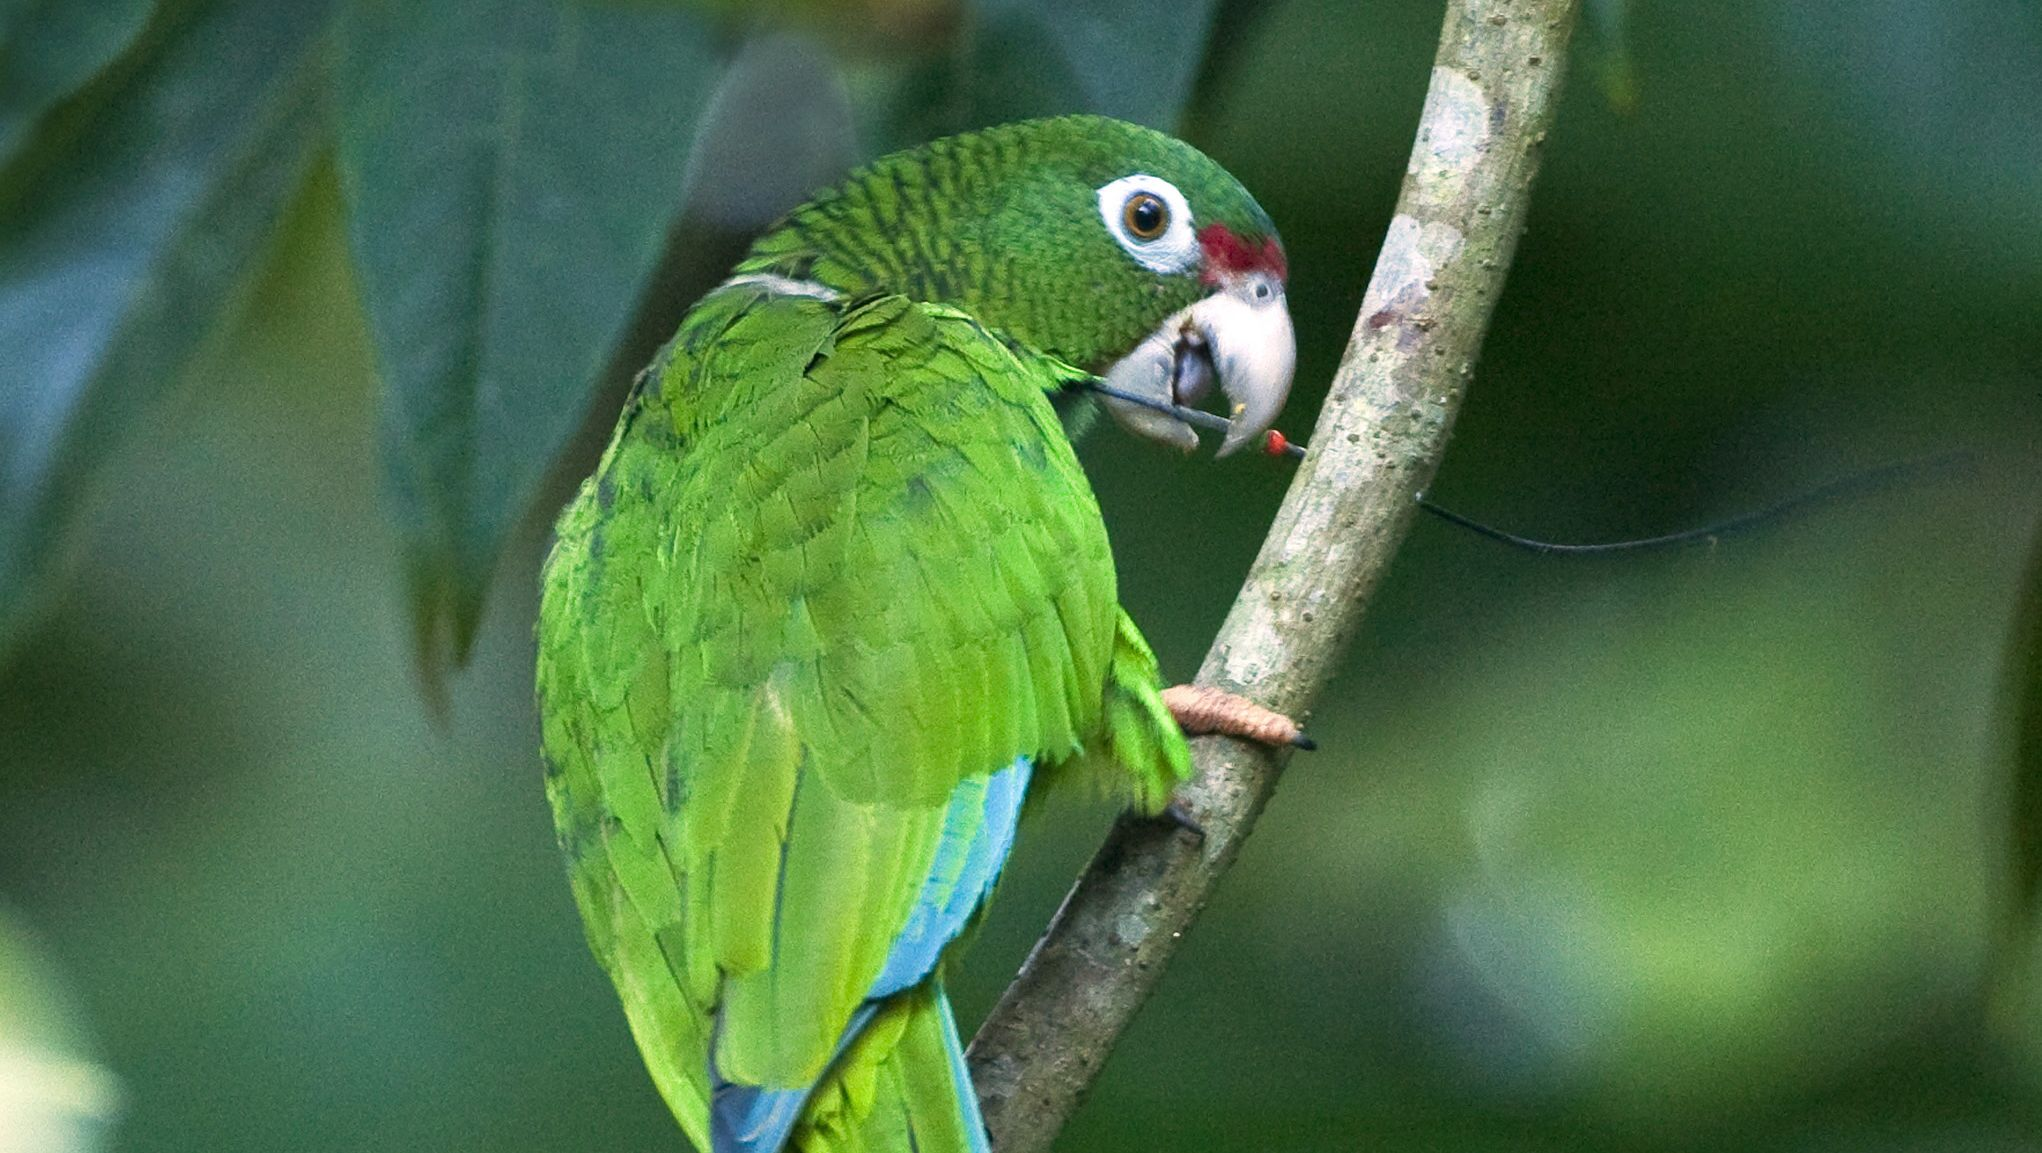 Wildlife Featured In Viva Puerto Rico Weathers Hurricane